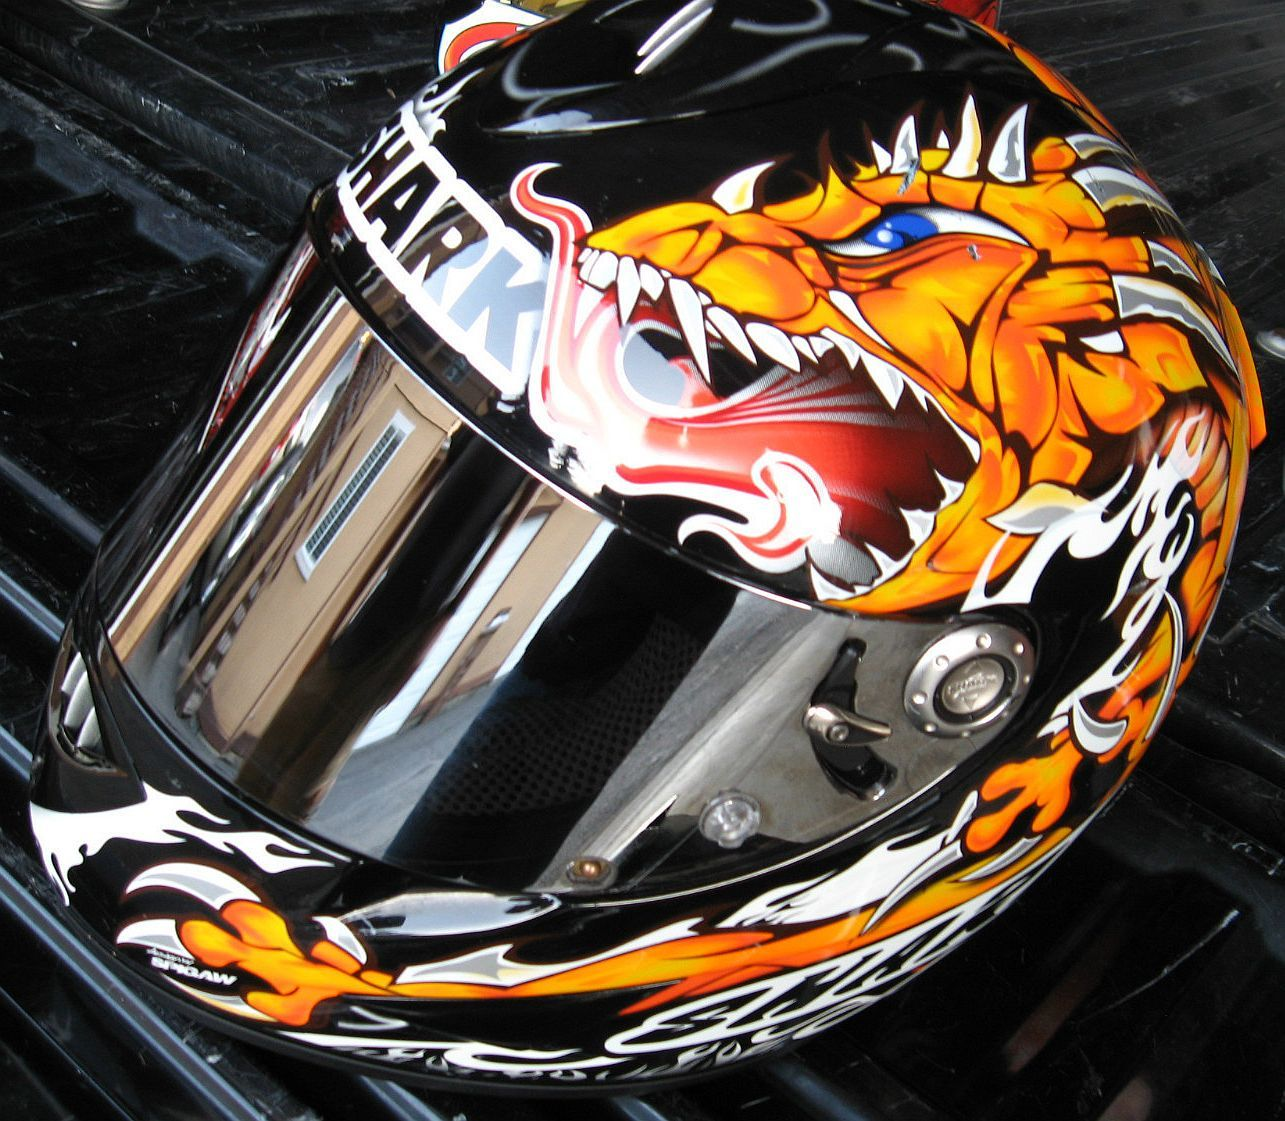 fa0d7e58 Shark Motorcycle Helmet (Men's Pre-owned RSR2 Streetbike Helmet, Size XL,  Miguel Duhamel Race Replica, Silver & Clear Irridium Shield)